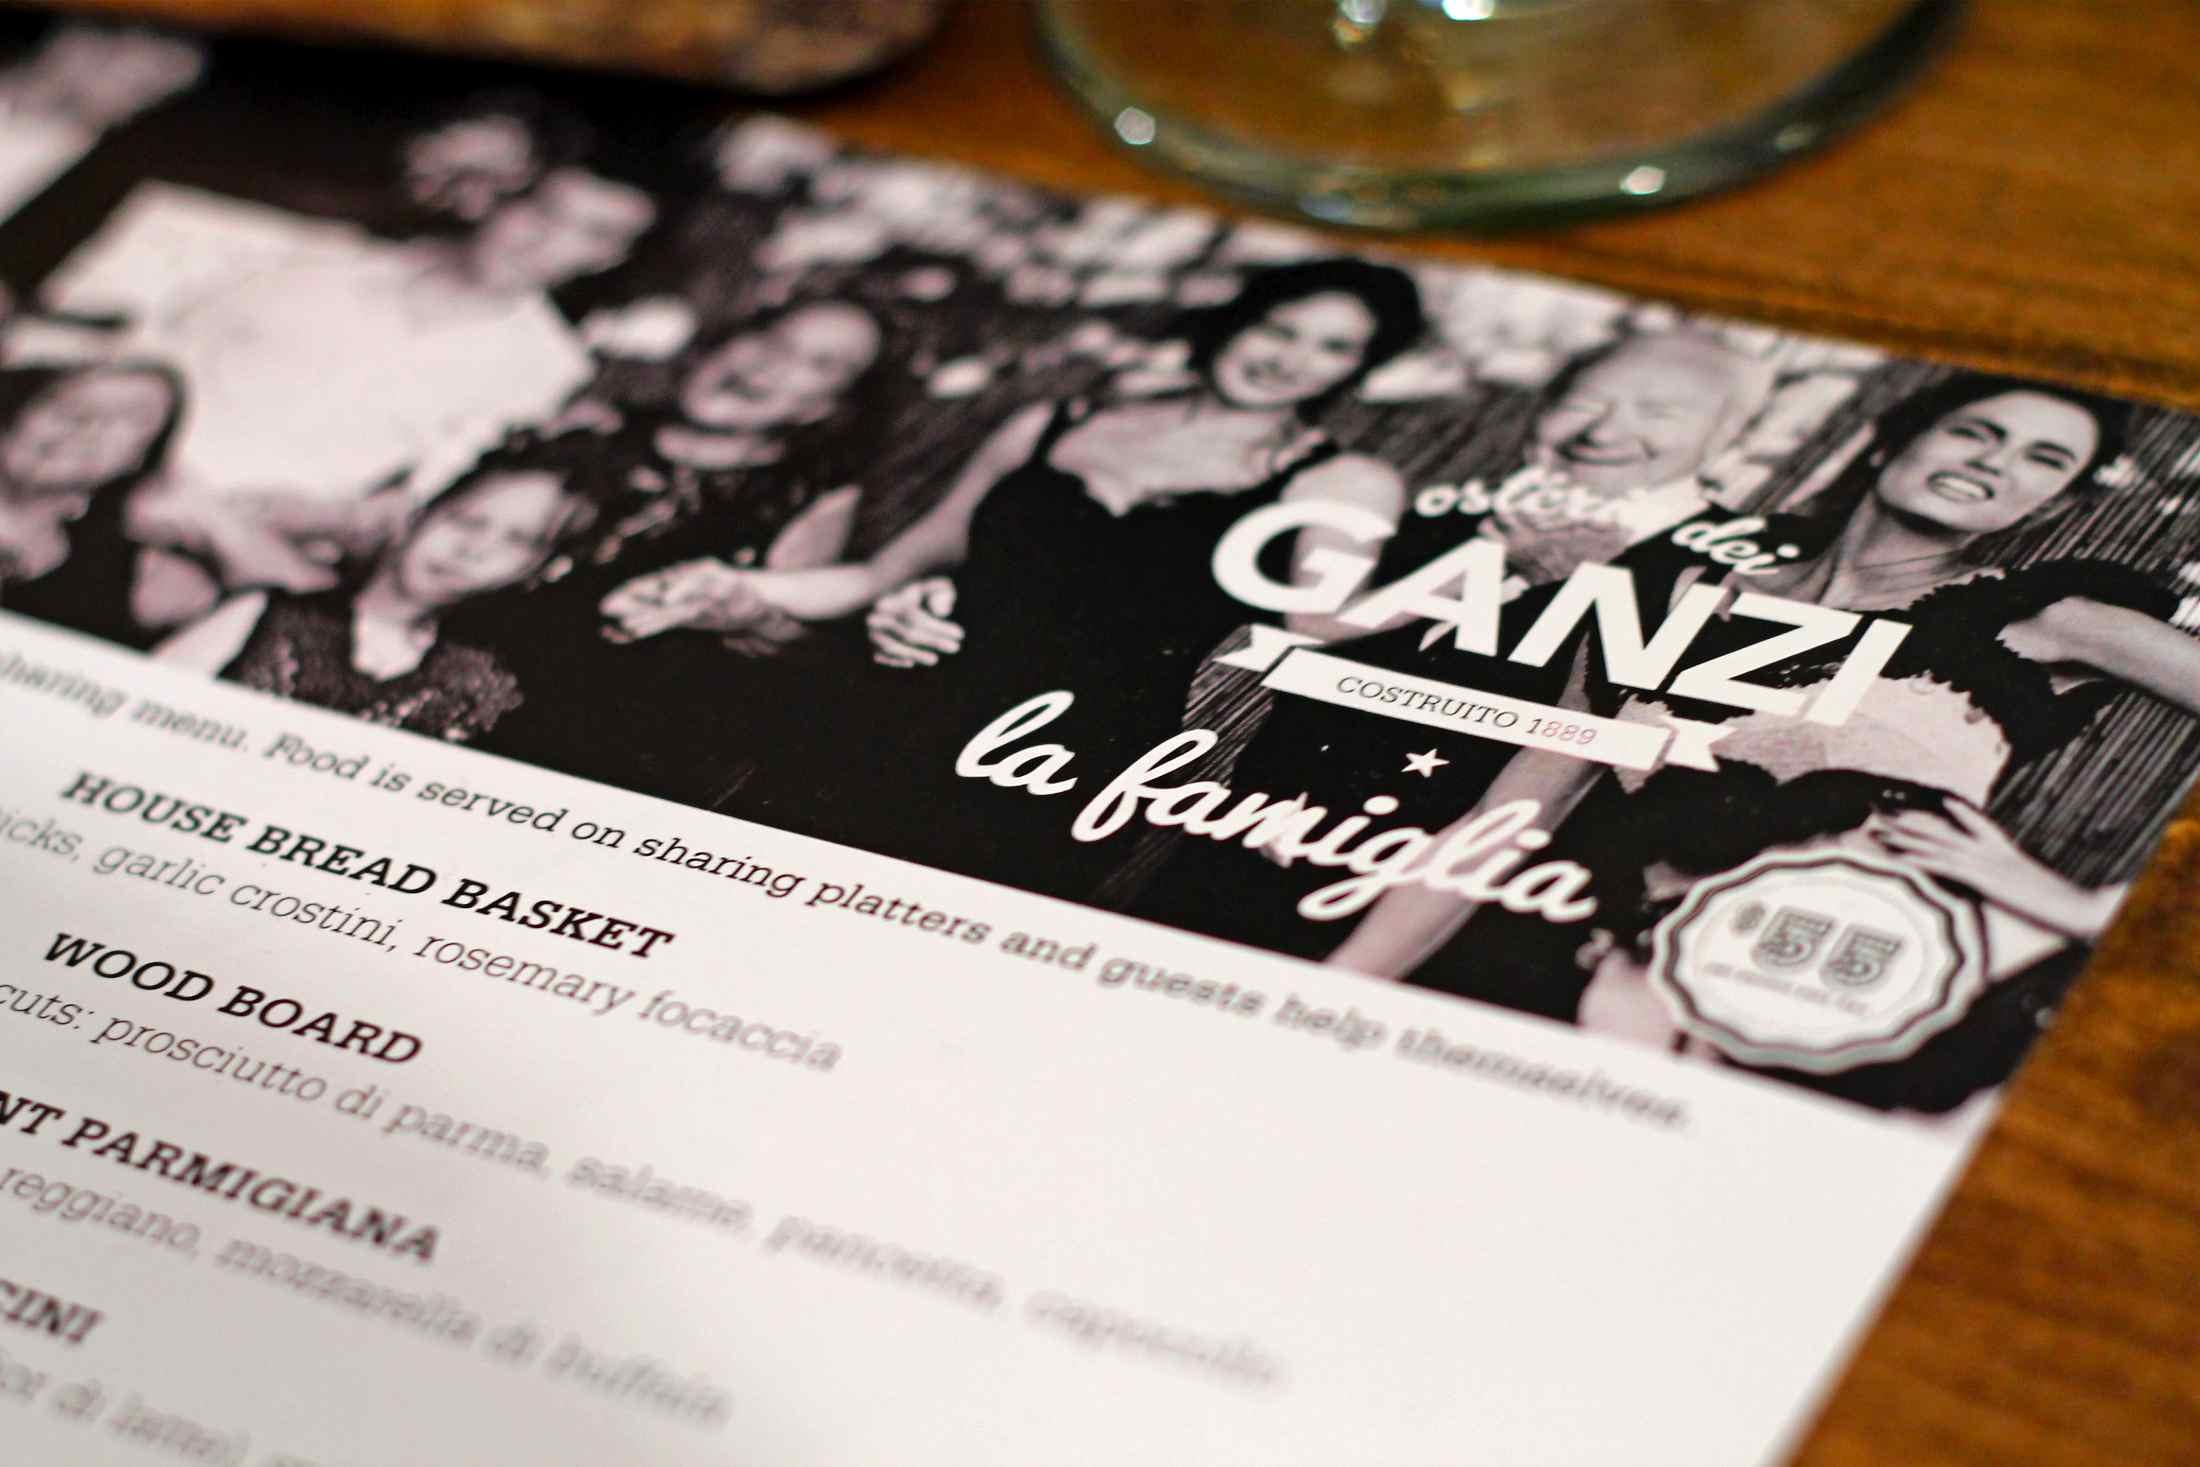 Ganzi - Focal Journey (by Gustavo Espinola)